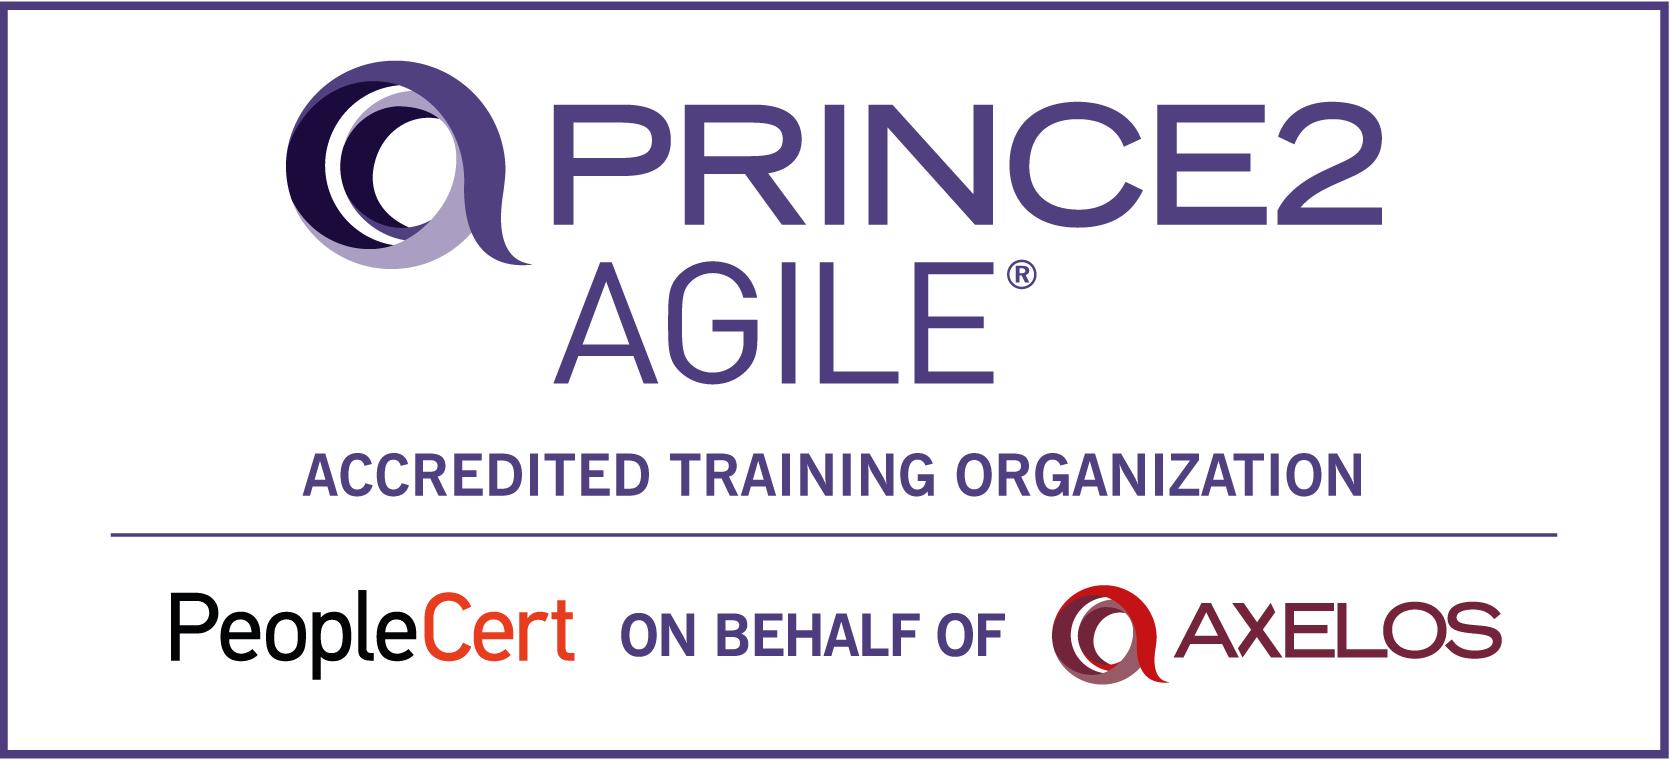 formation PRINCE2 Agile